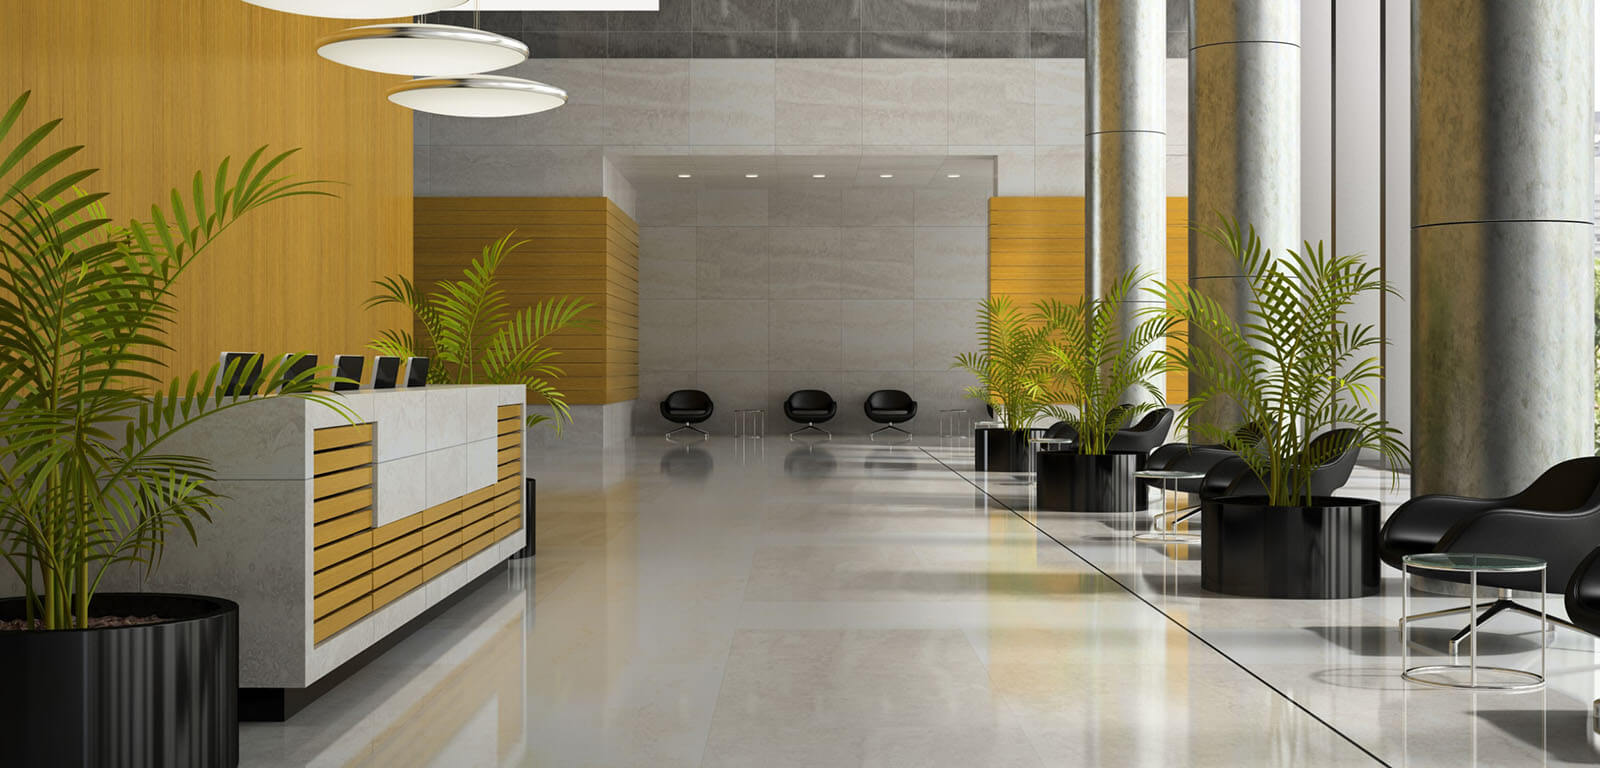 hotel pest control hospitality eagleshield